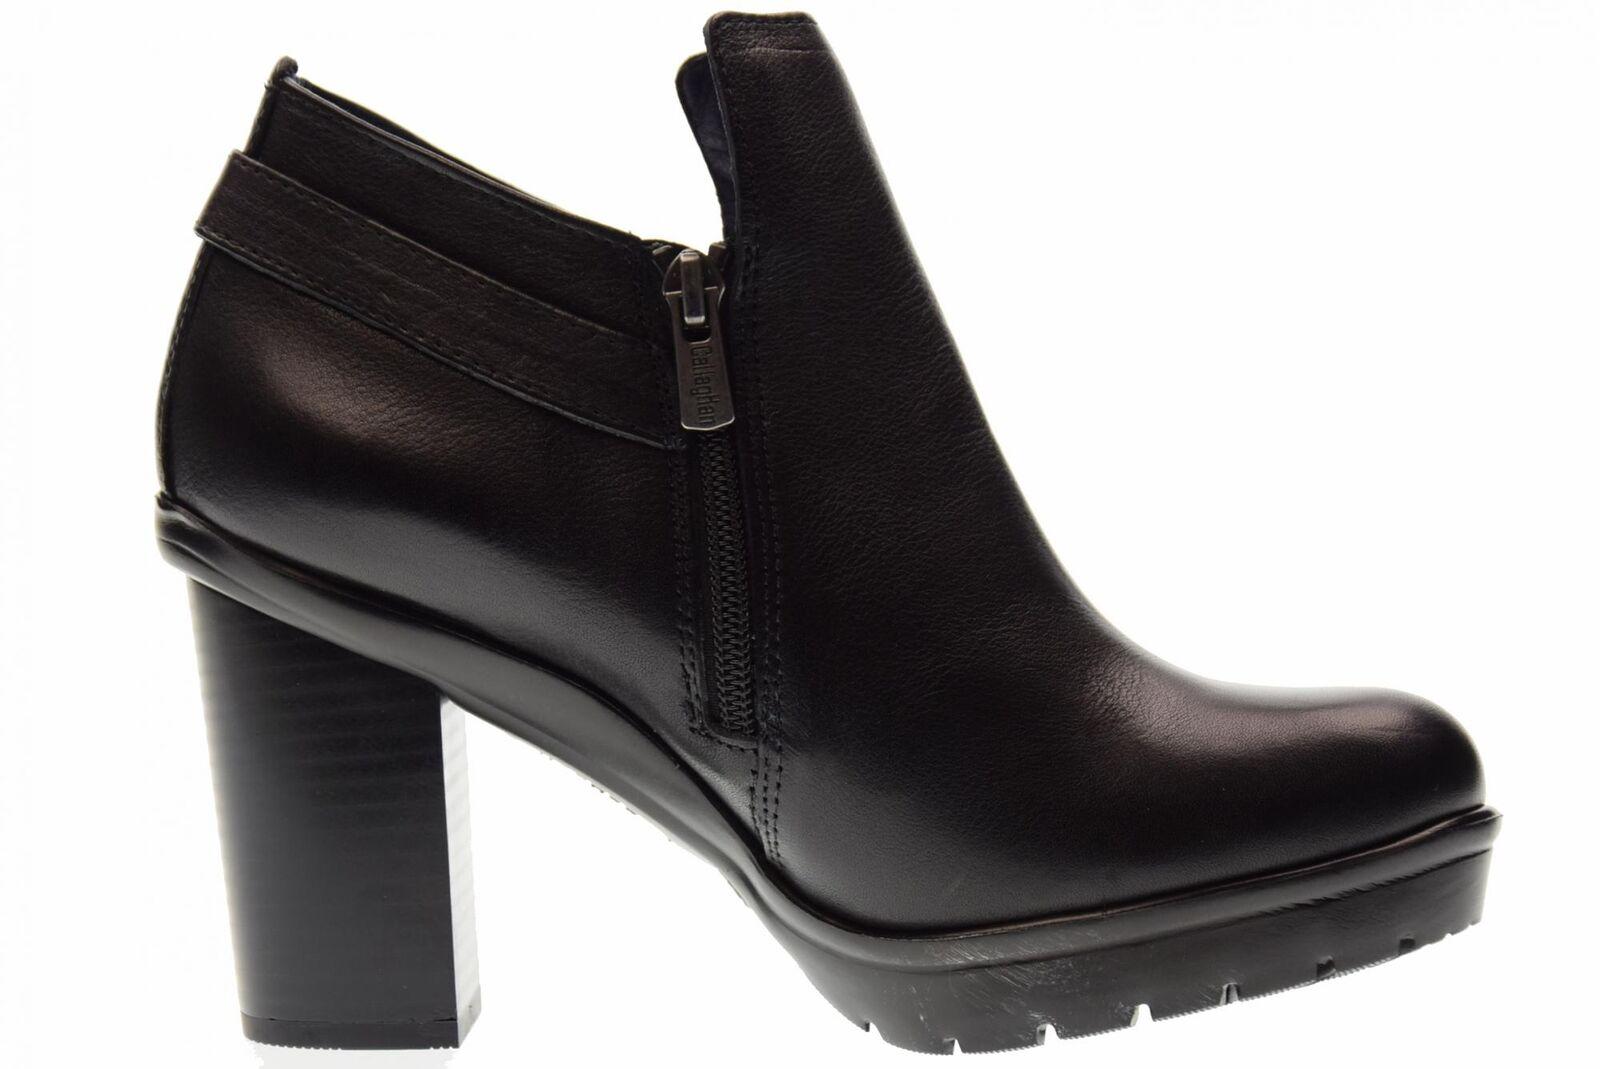 Callaghan zapatos botas de mujer mujer mujer A17us 99812 Negro 9a11bf